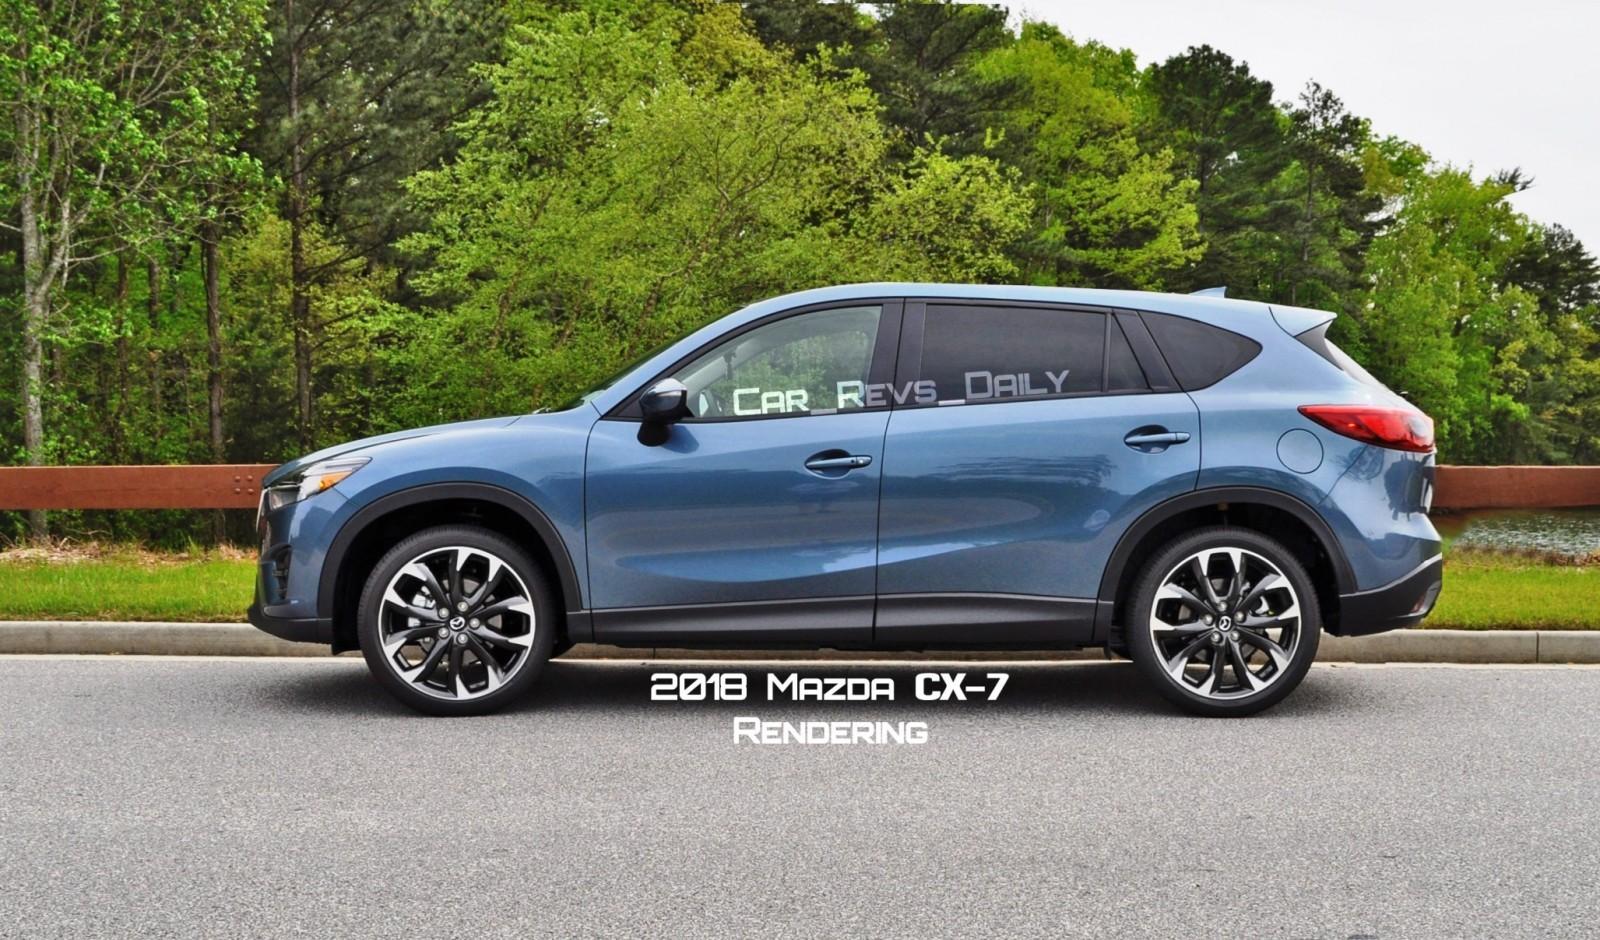 Kelebihan Mazda Cx 7 2017 Tangguh